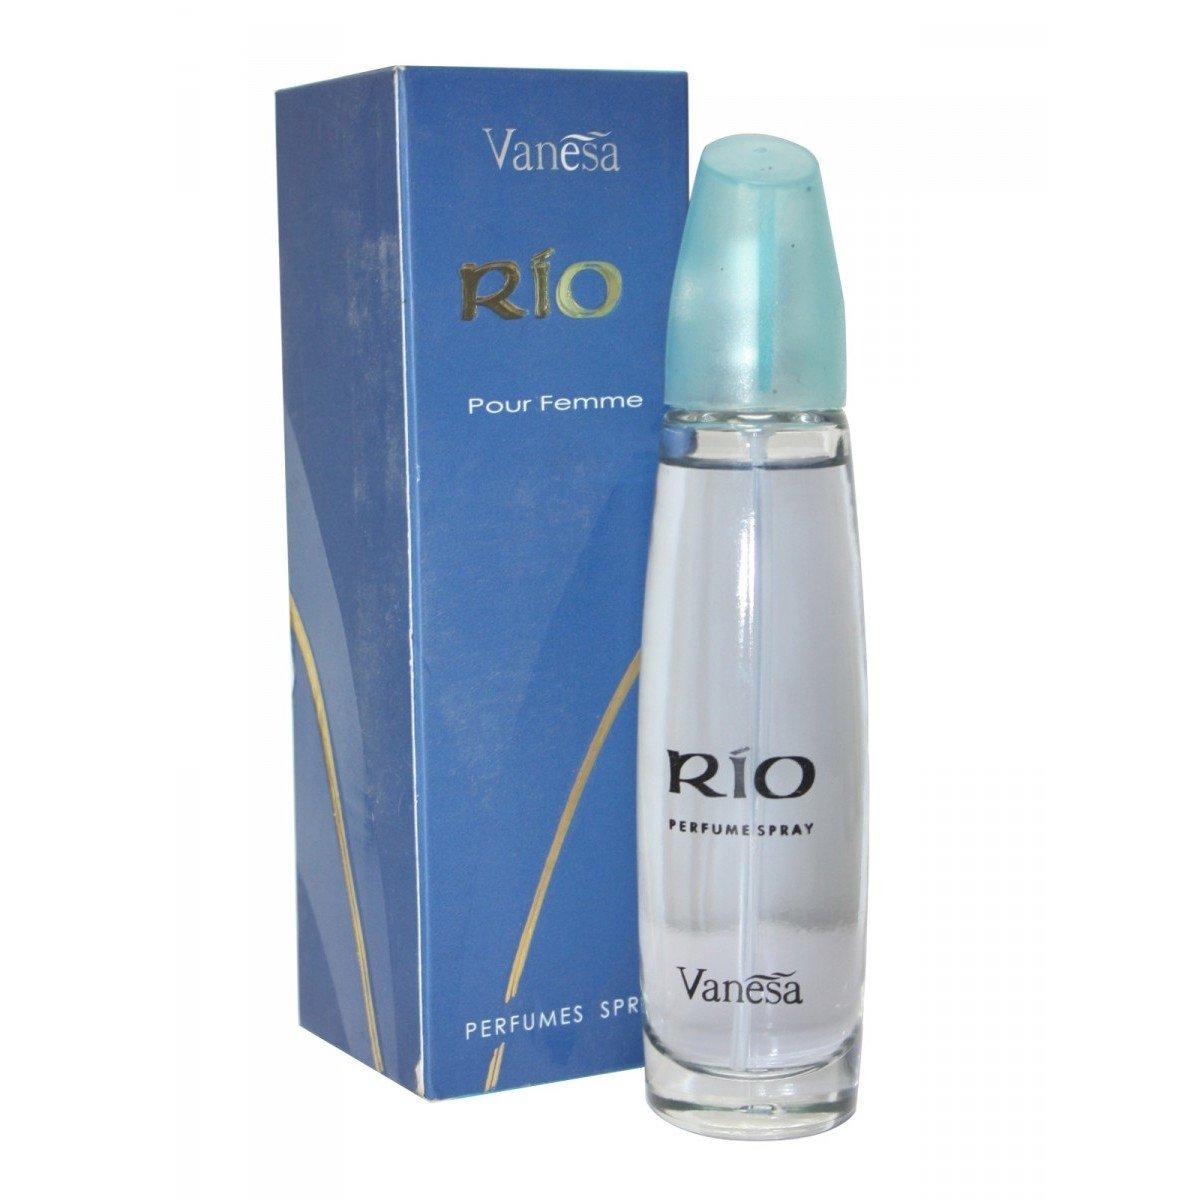 rio perfume